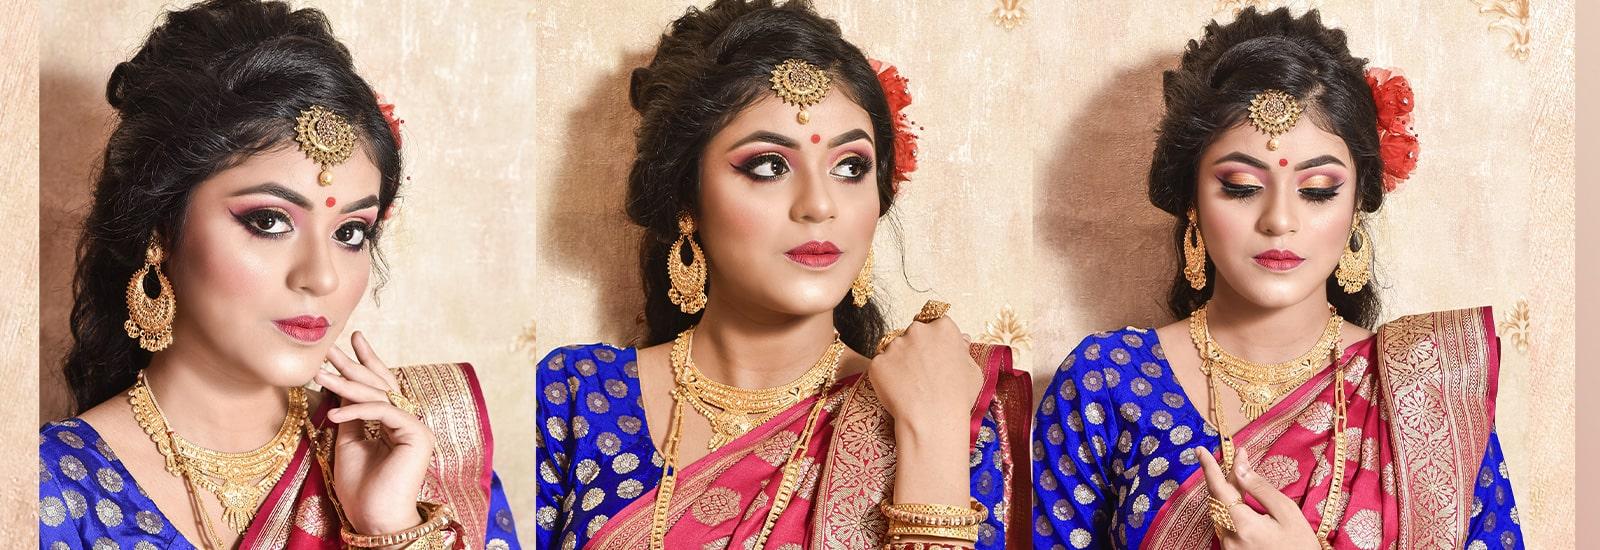 best-bridal-makeup-artist-in-kolkata-glisten-makeover-by-nikita